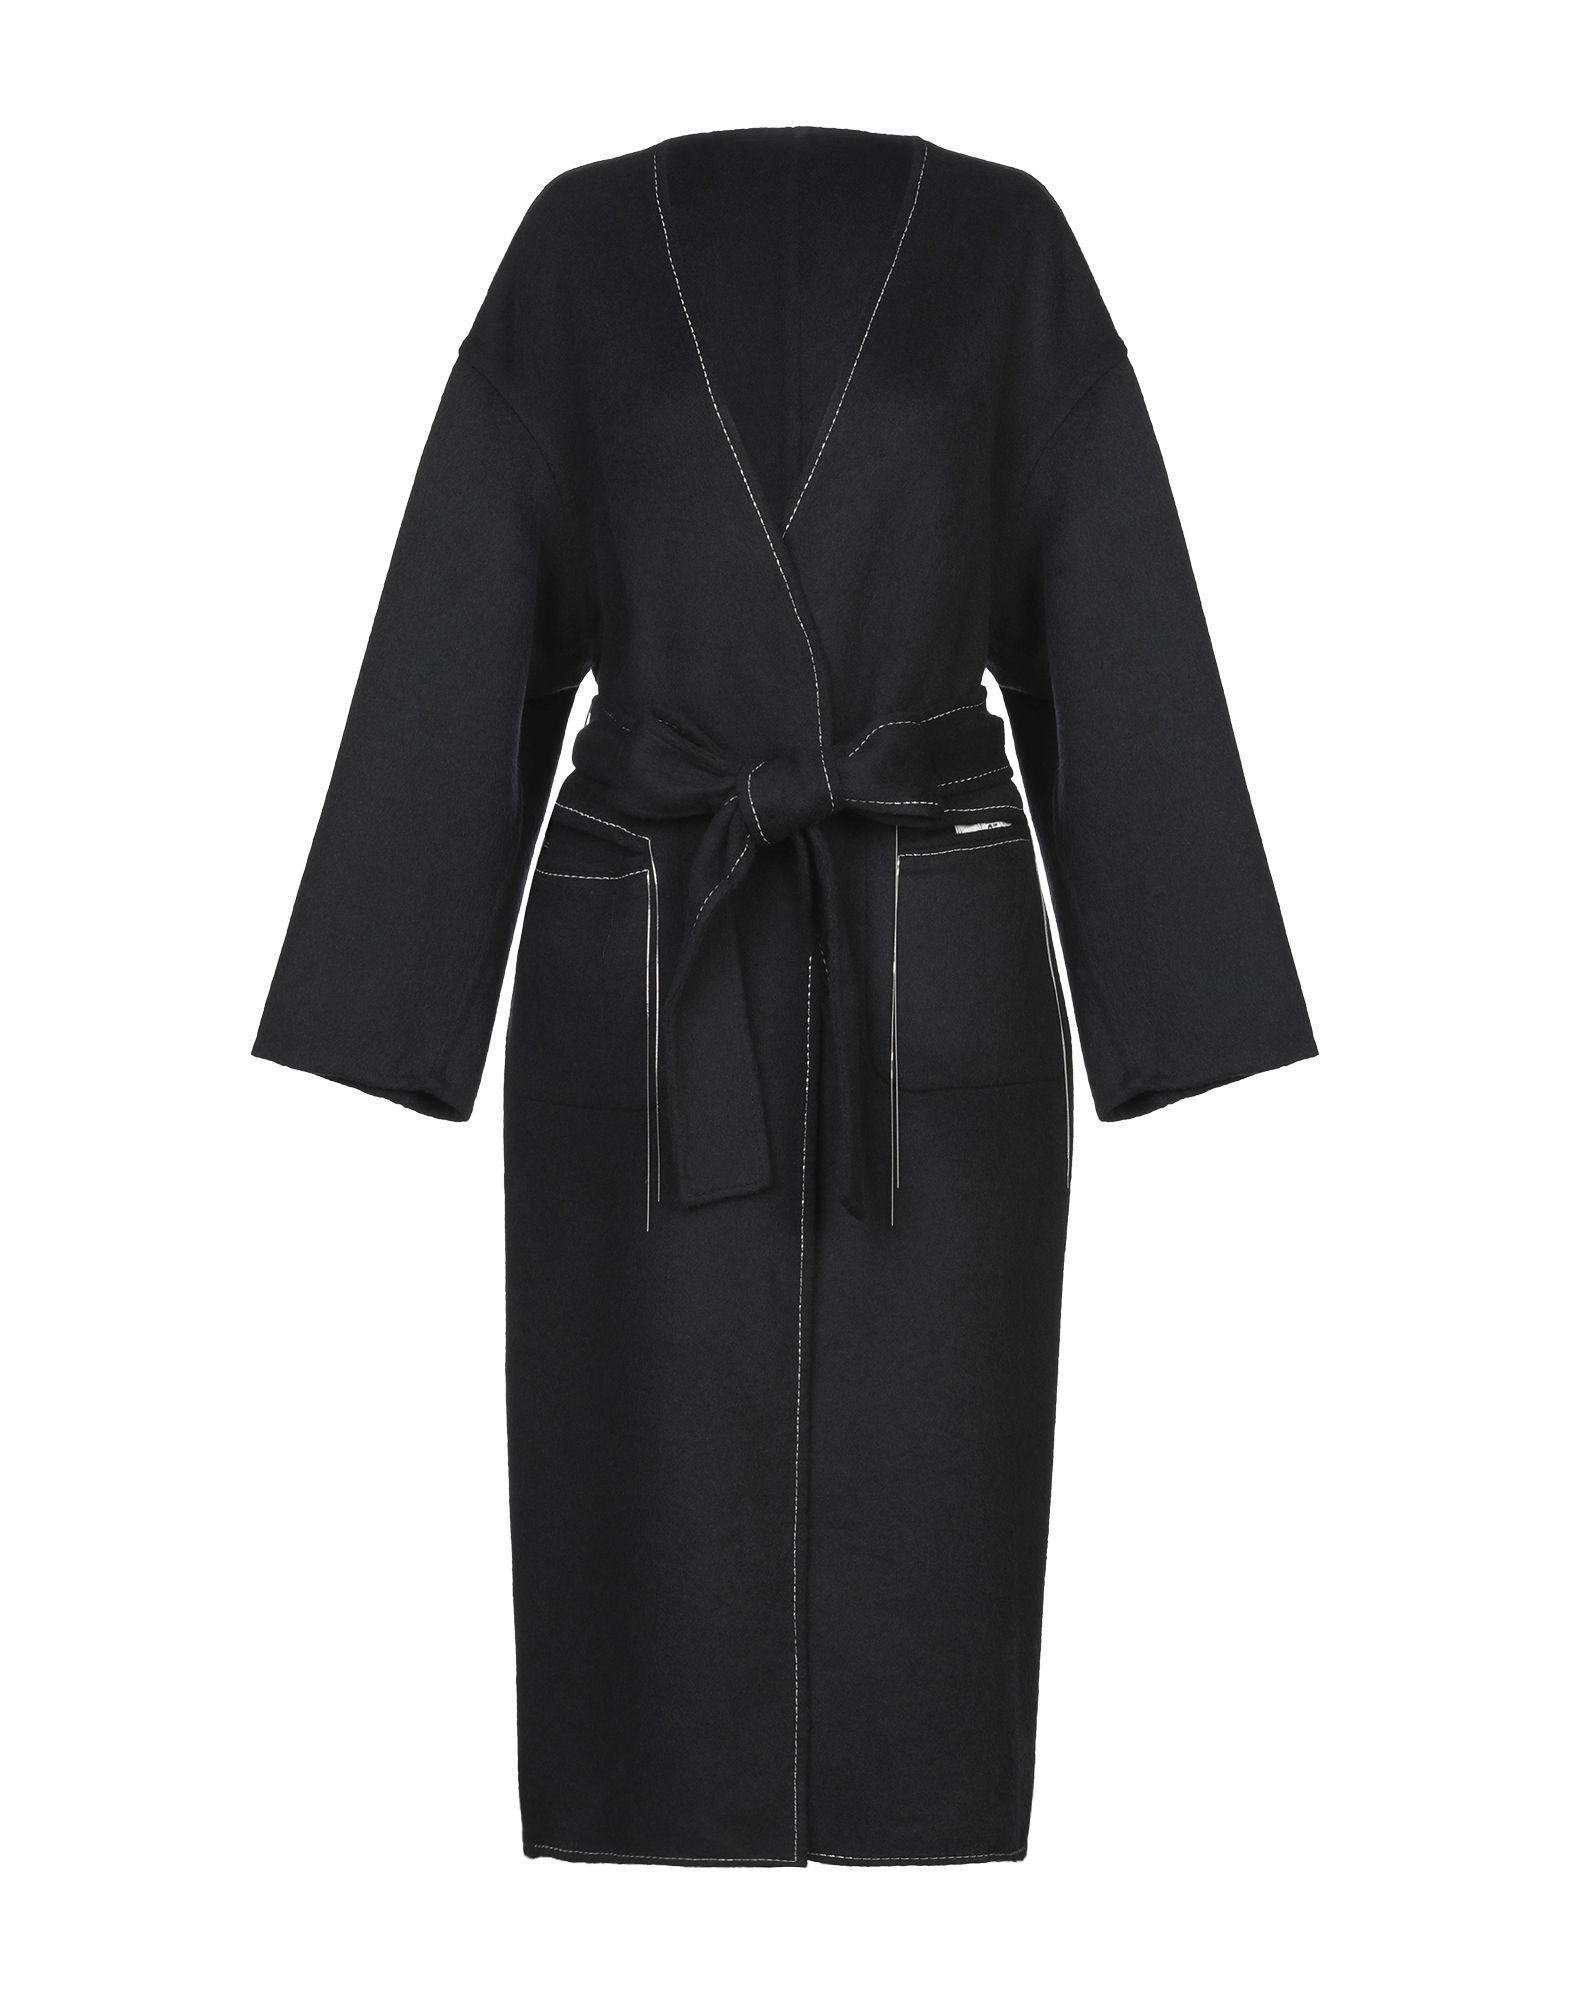 NOIR KEI NINOMIYA Пальто noir kei ninomiya легкое пальто